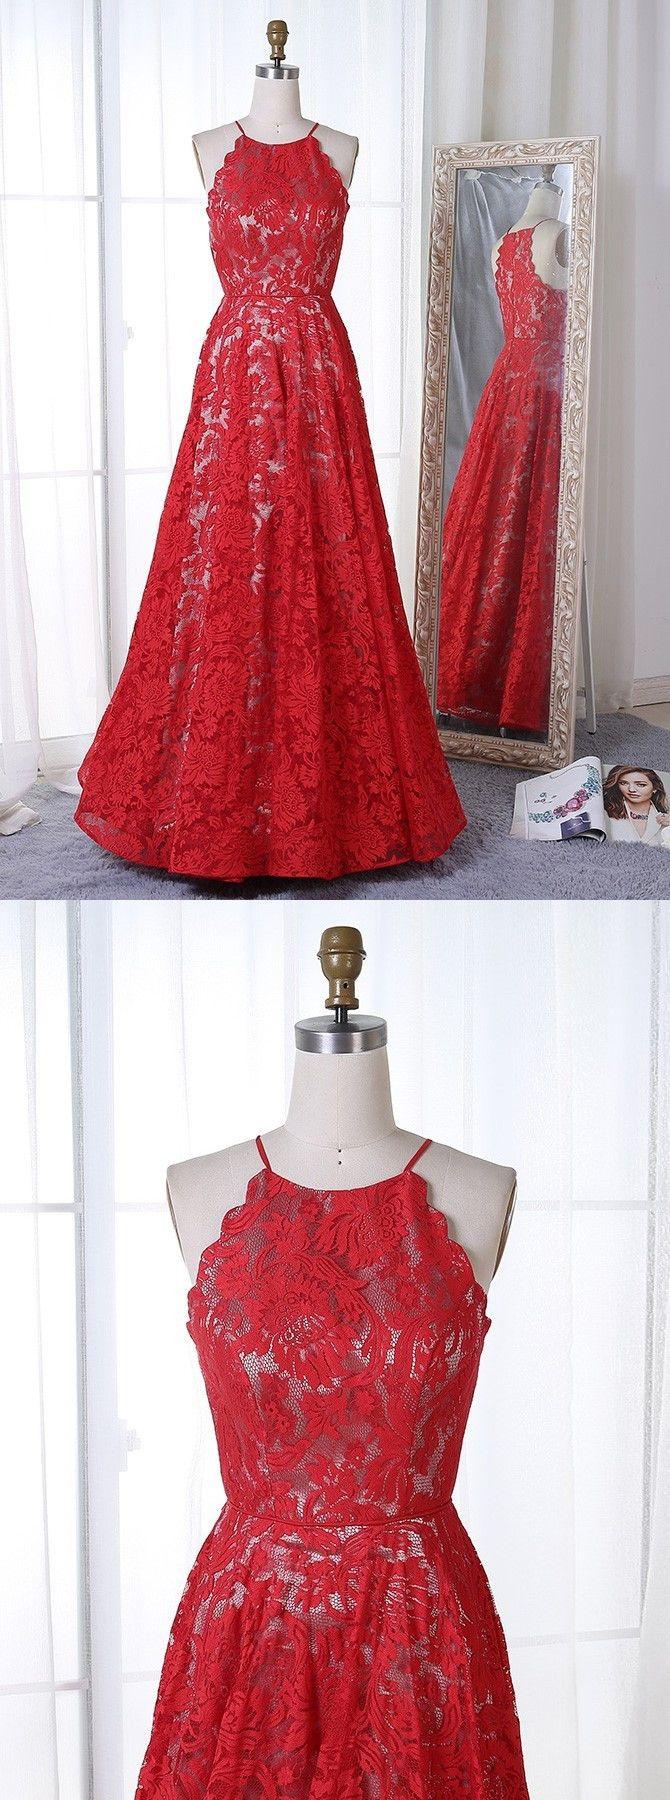 elegant red lace formal dresses, modest halter evening gowns, #eveninggowns #dresses